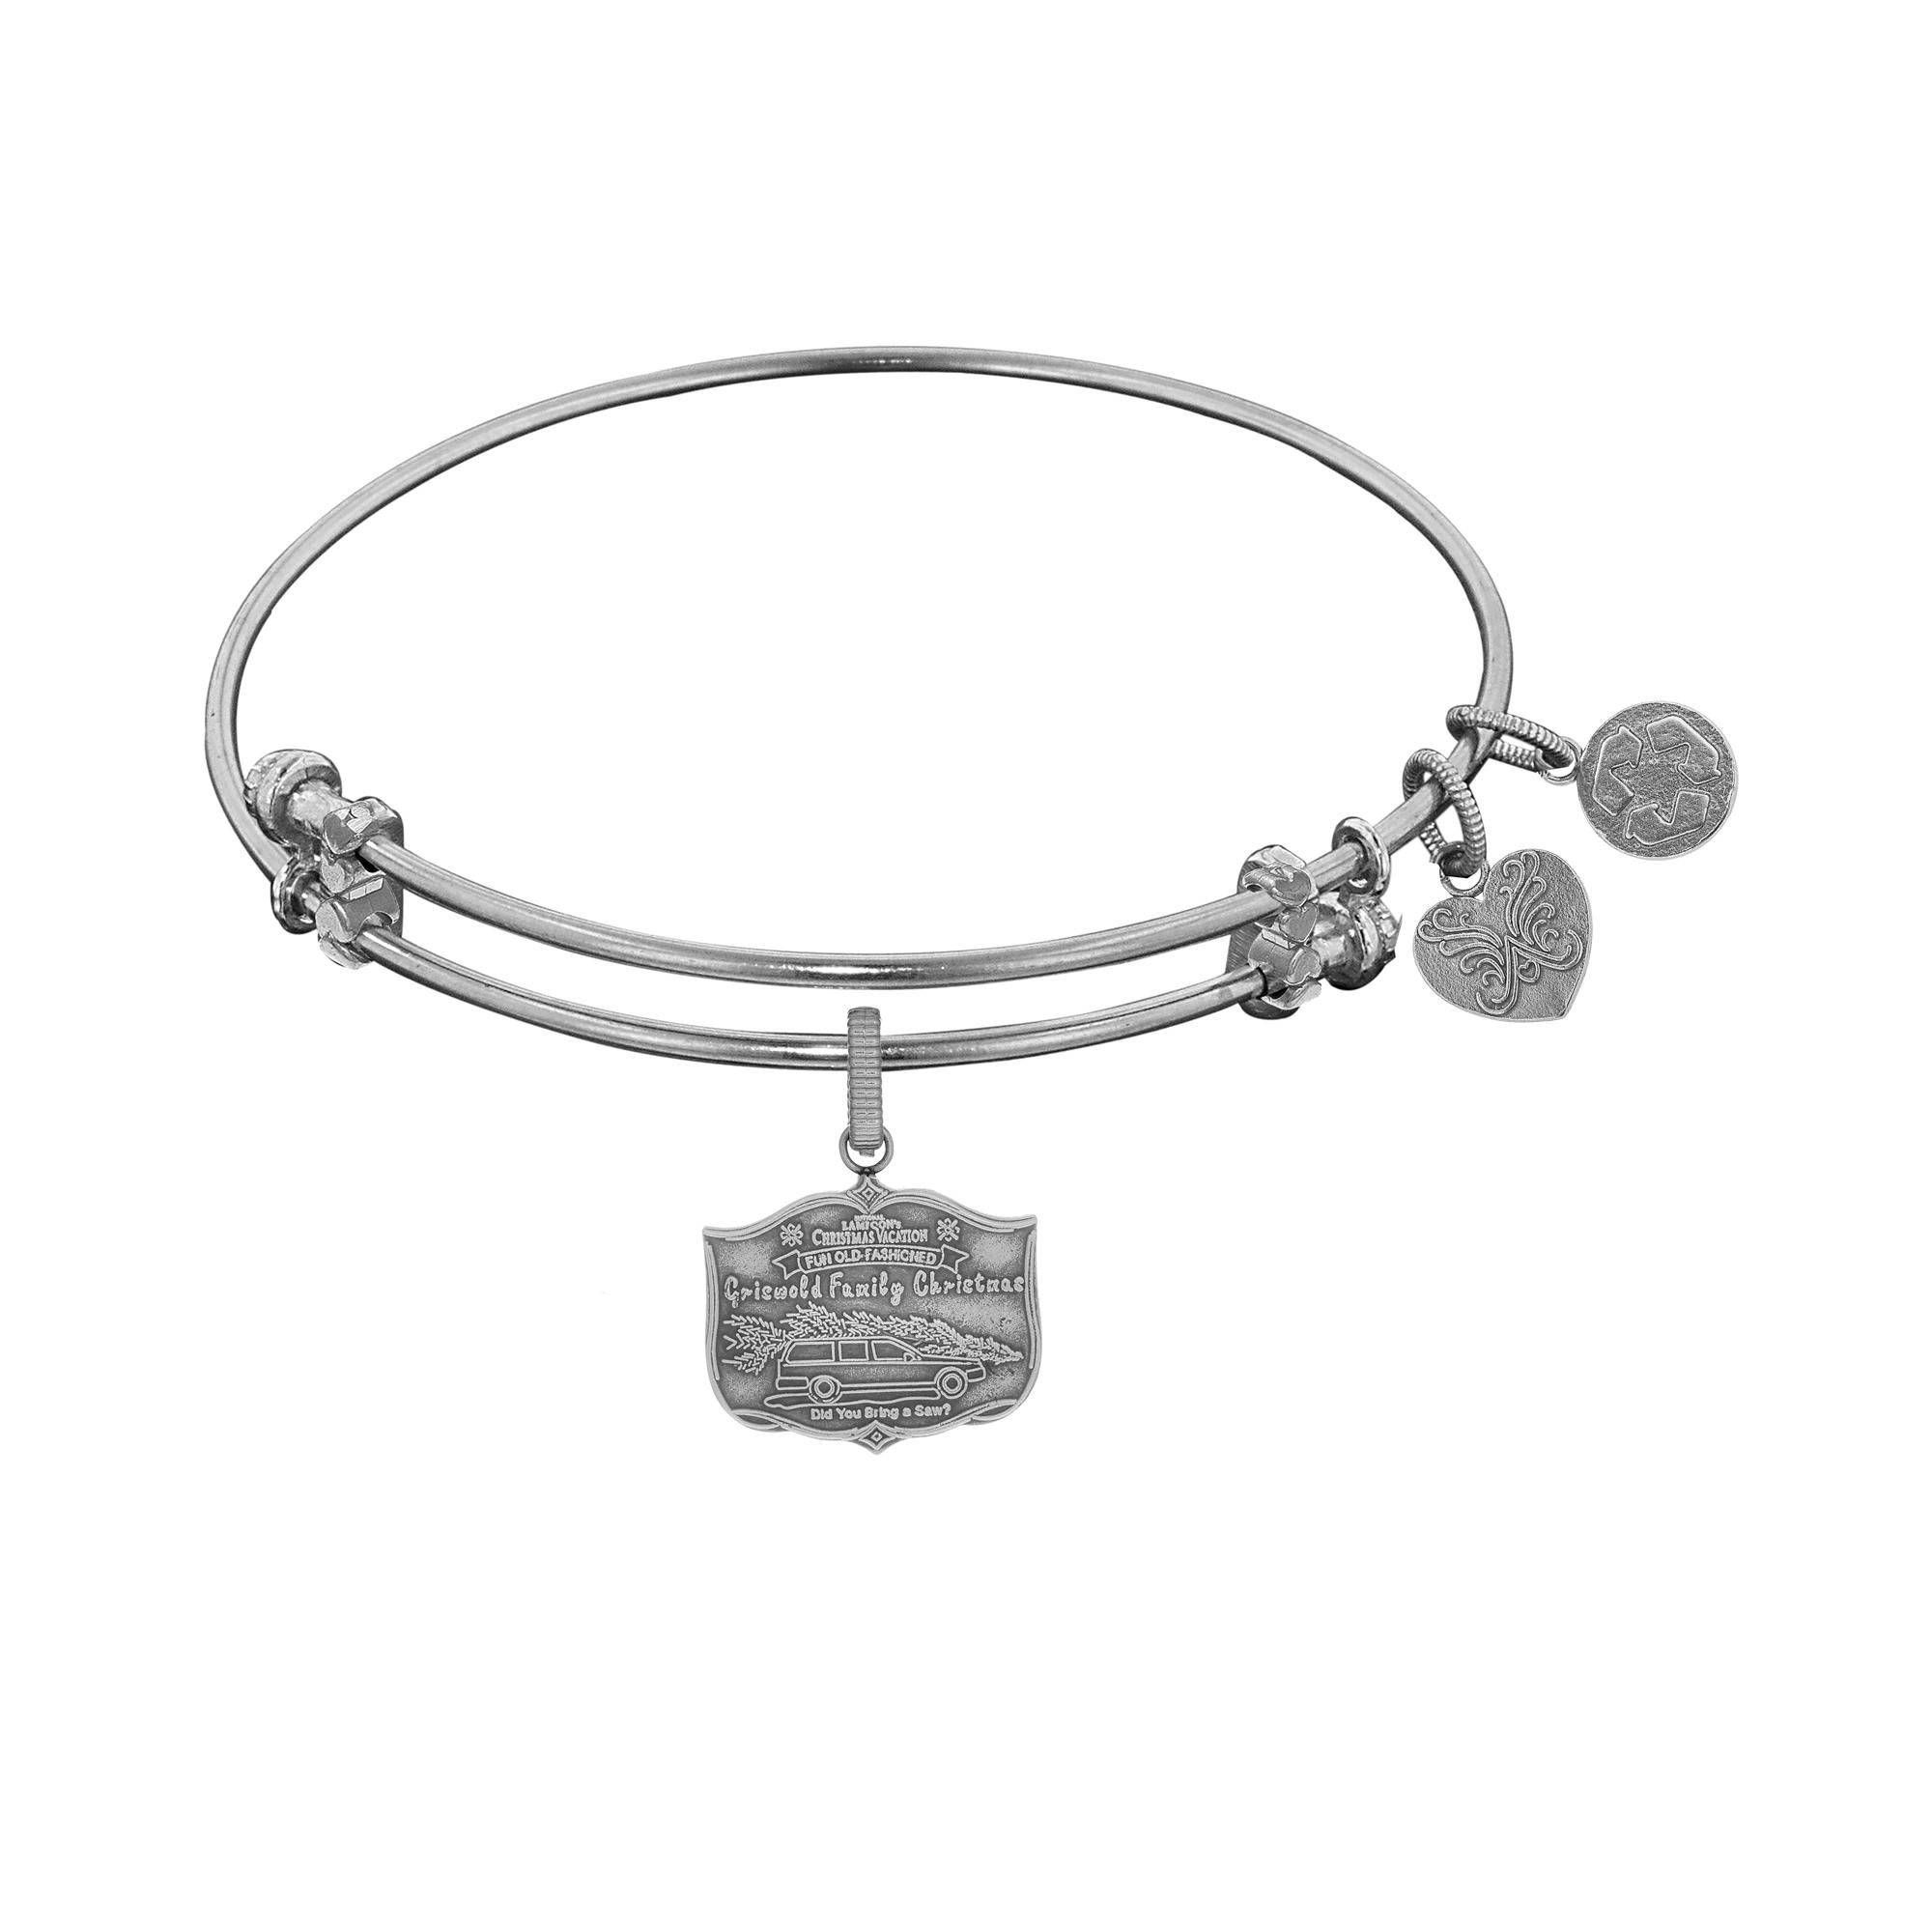 Rose Quartz Bead 50mm Diameter Angelica Bangle Bracelet